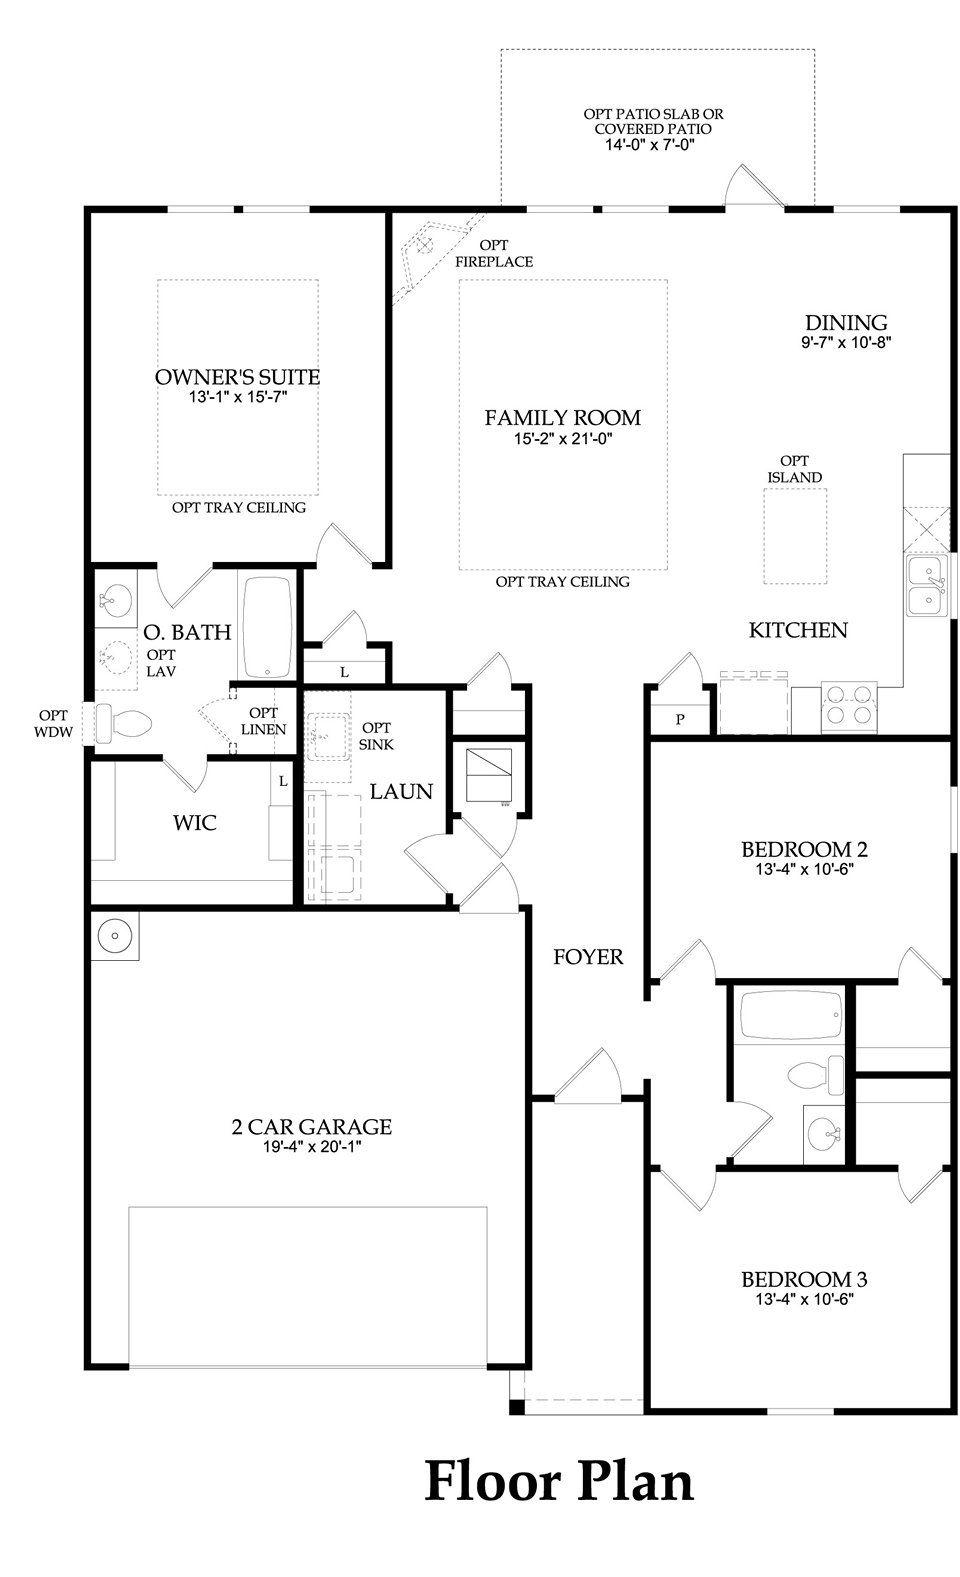 56630bbc2d2f77f305809c25197d5147 stirling bridge austin tx new homes centex homes rosemont,Centex Home Plans